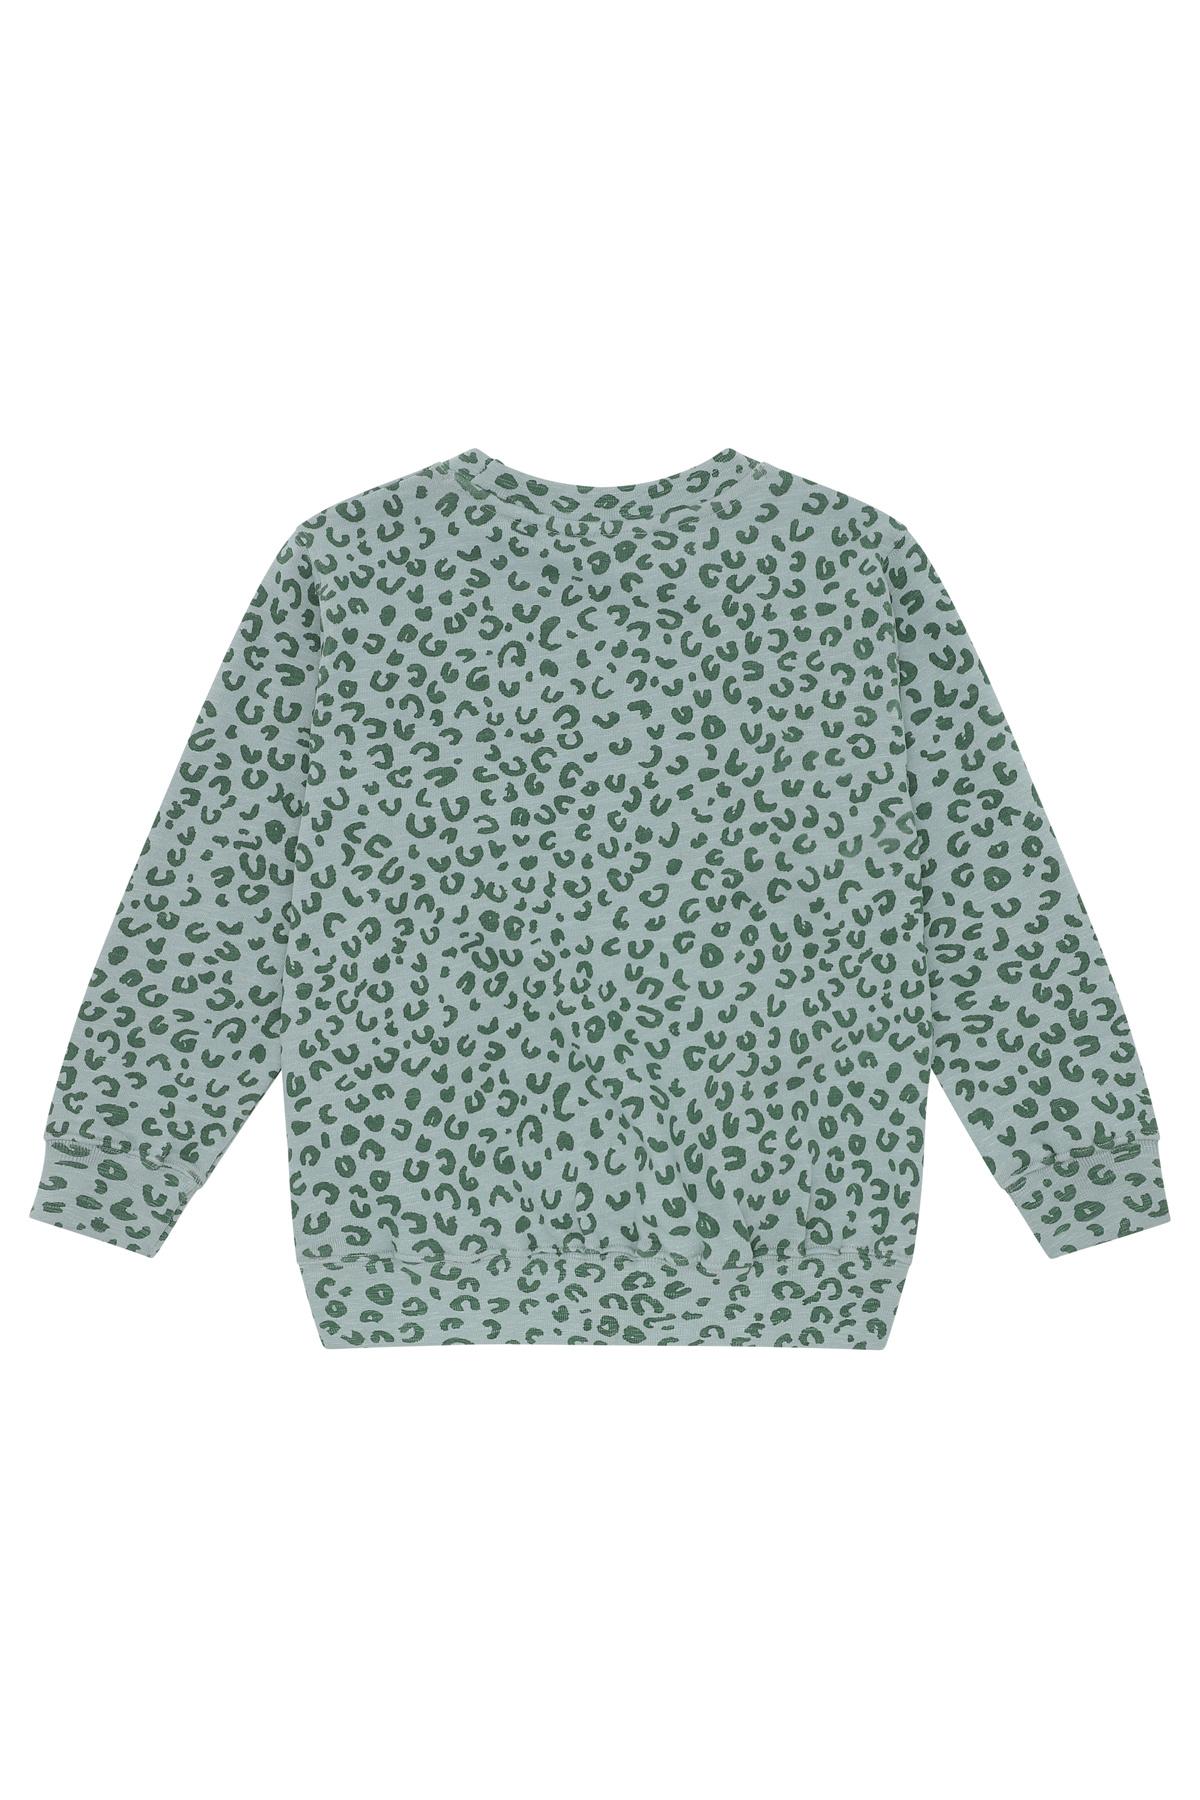 Baptiste sweatshirt - Slate Leopspot-2